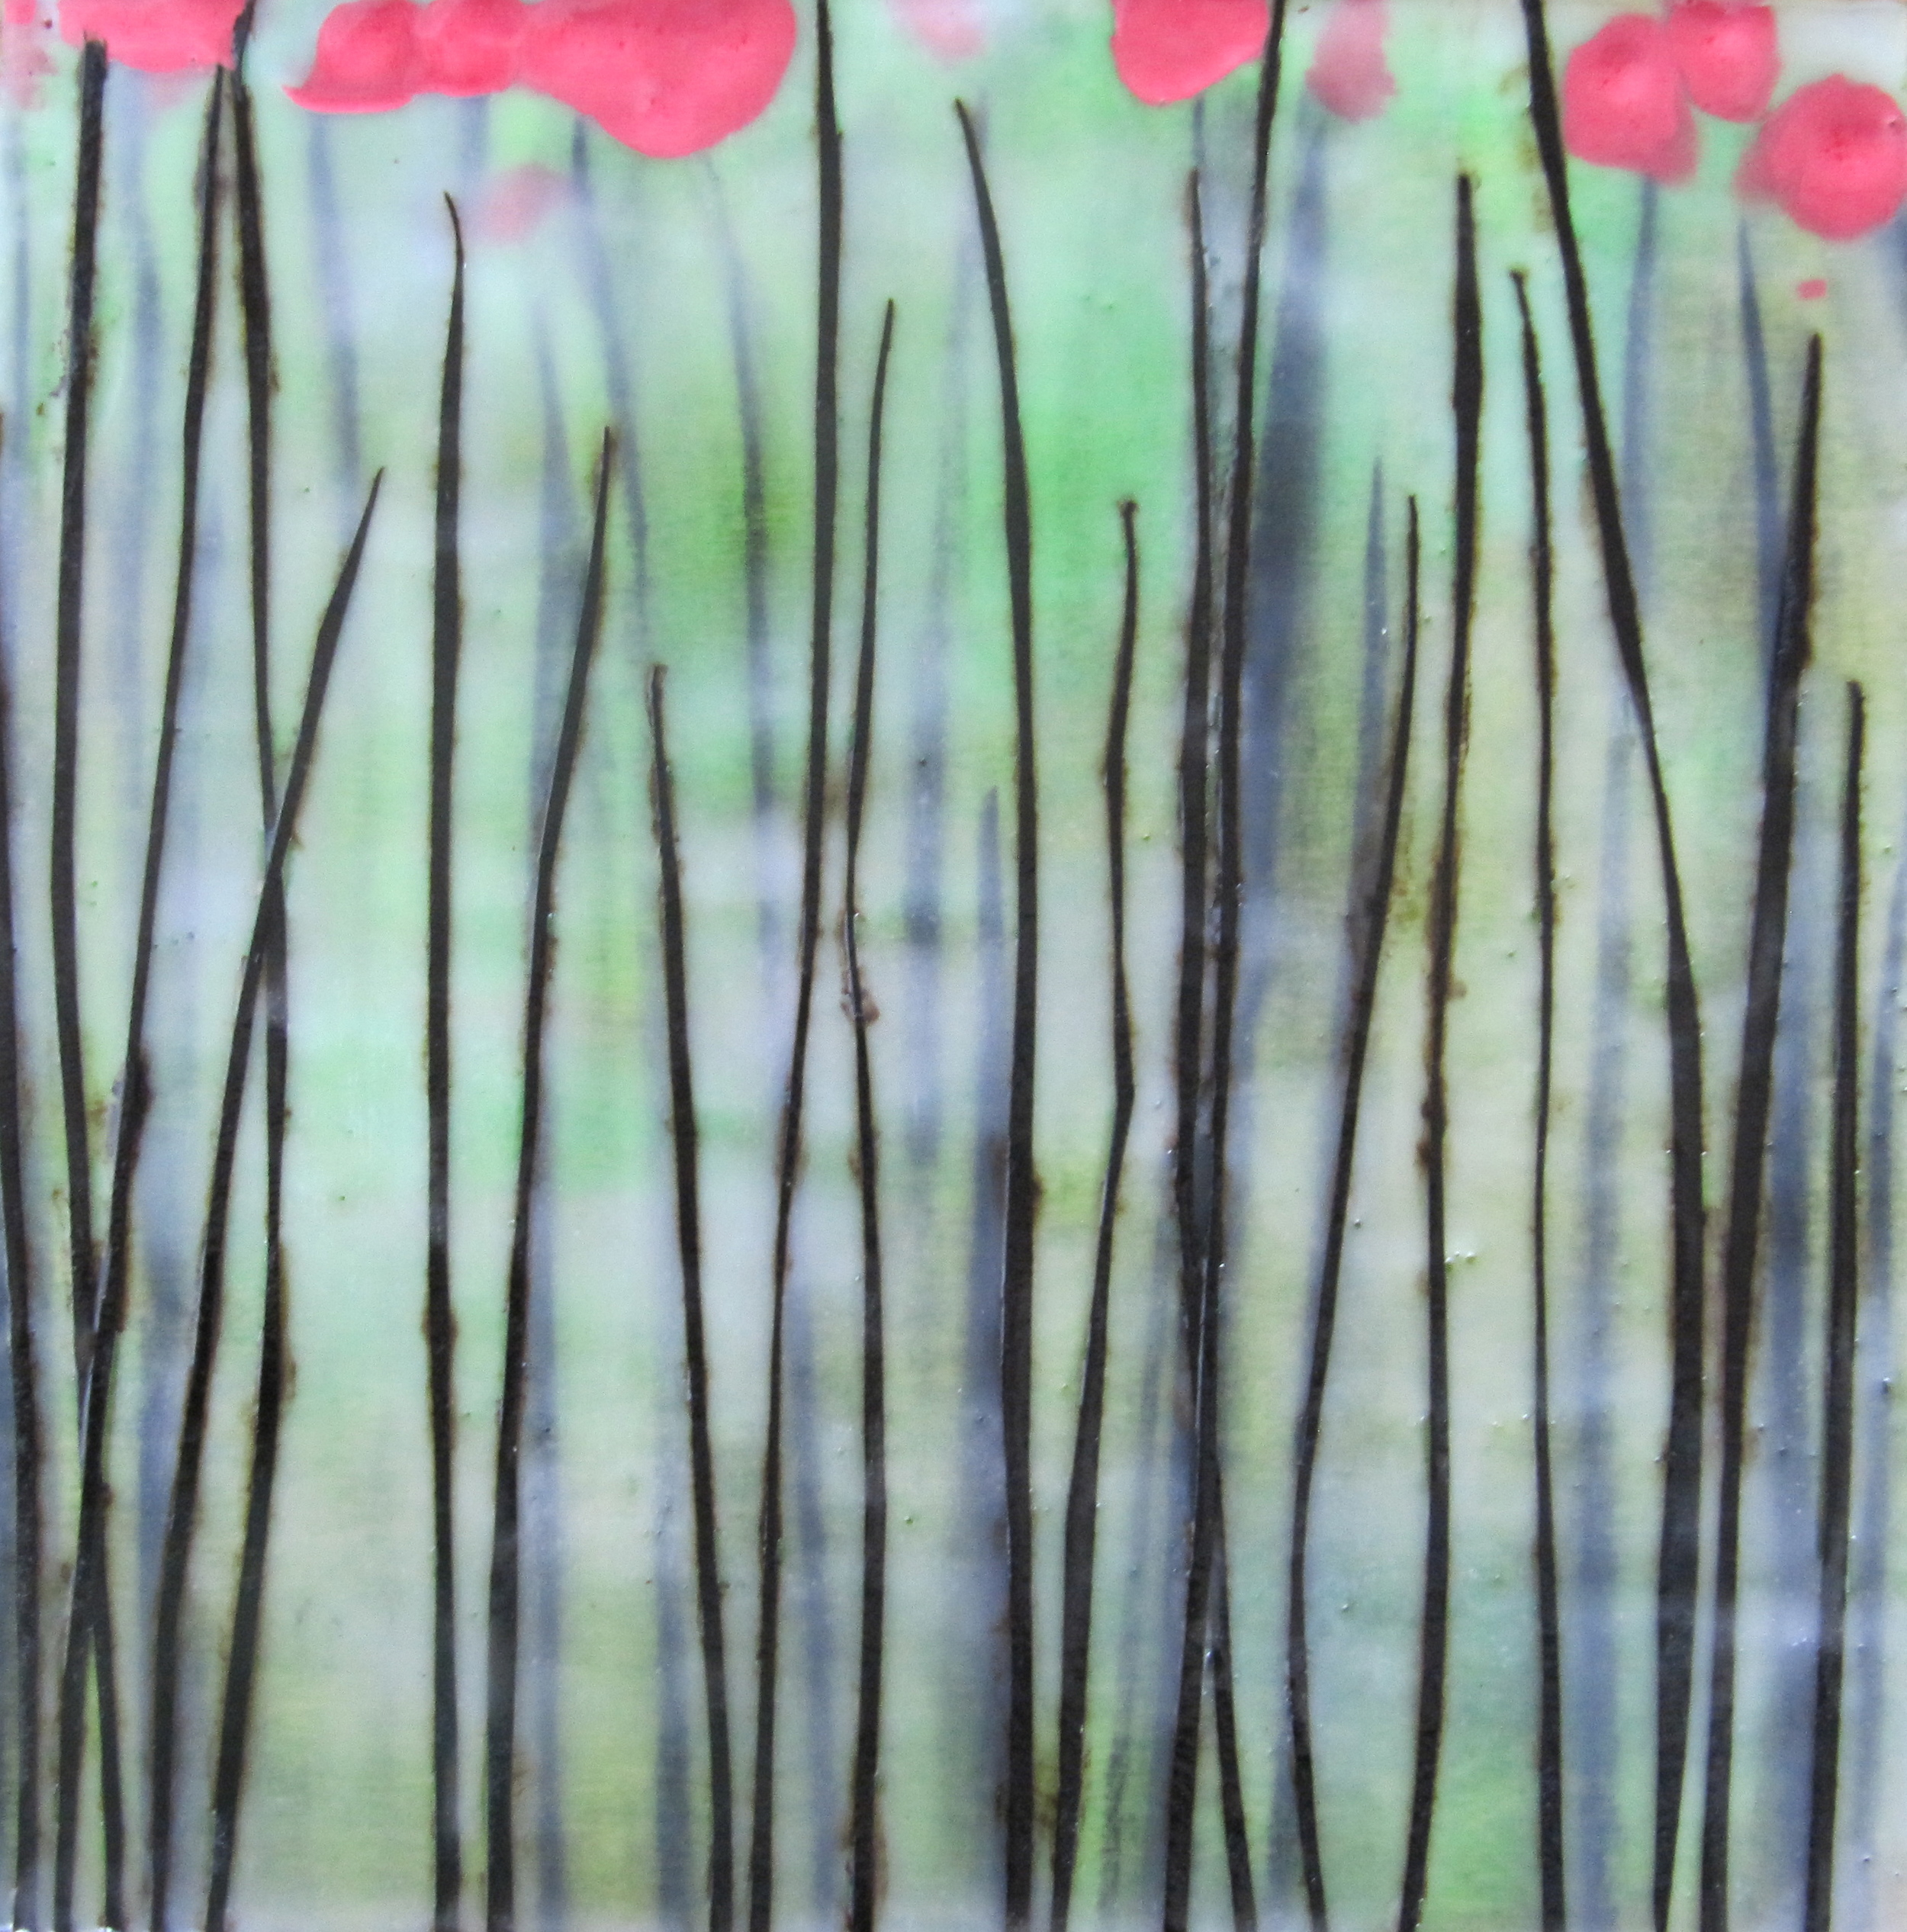 Flora, 2011 / Encaustic on wood panel, 10 x 10 / Sold